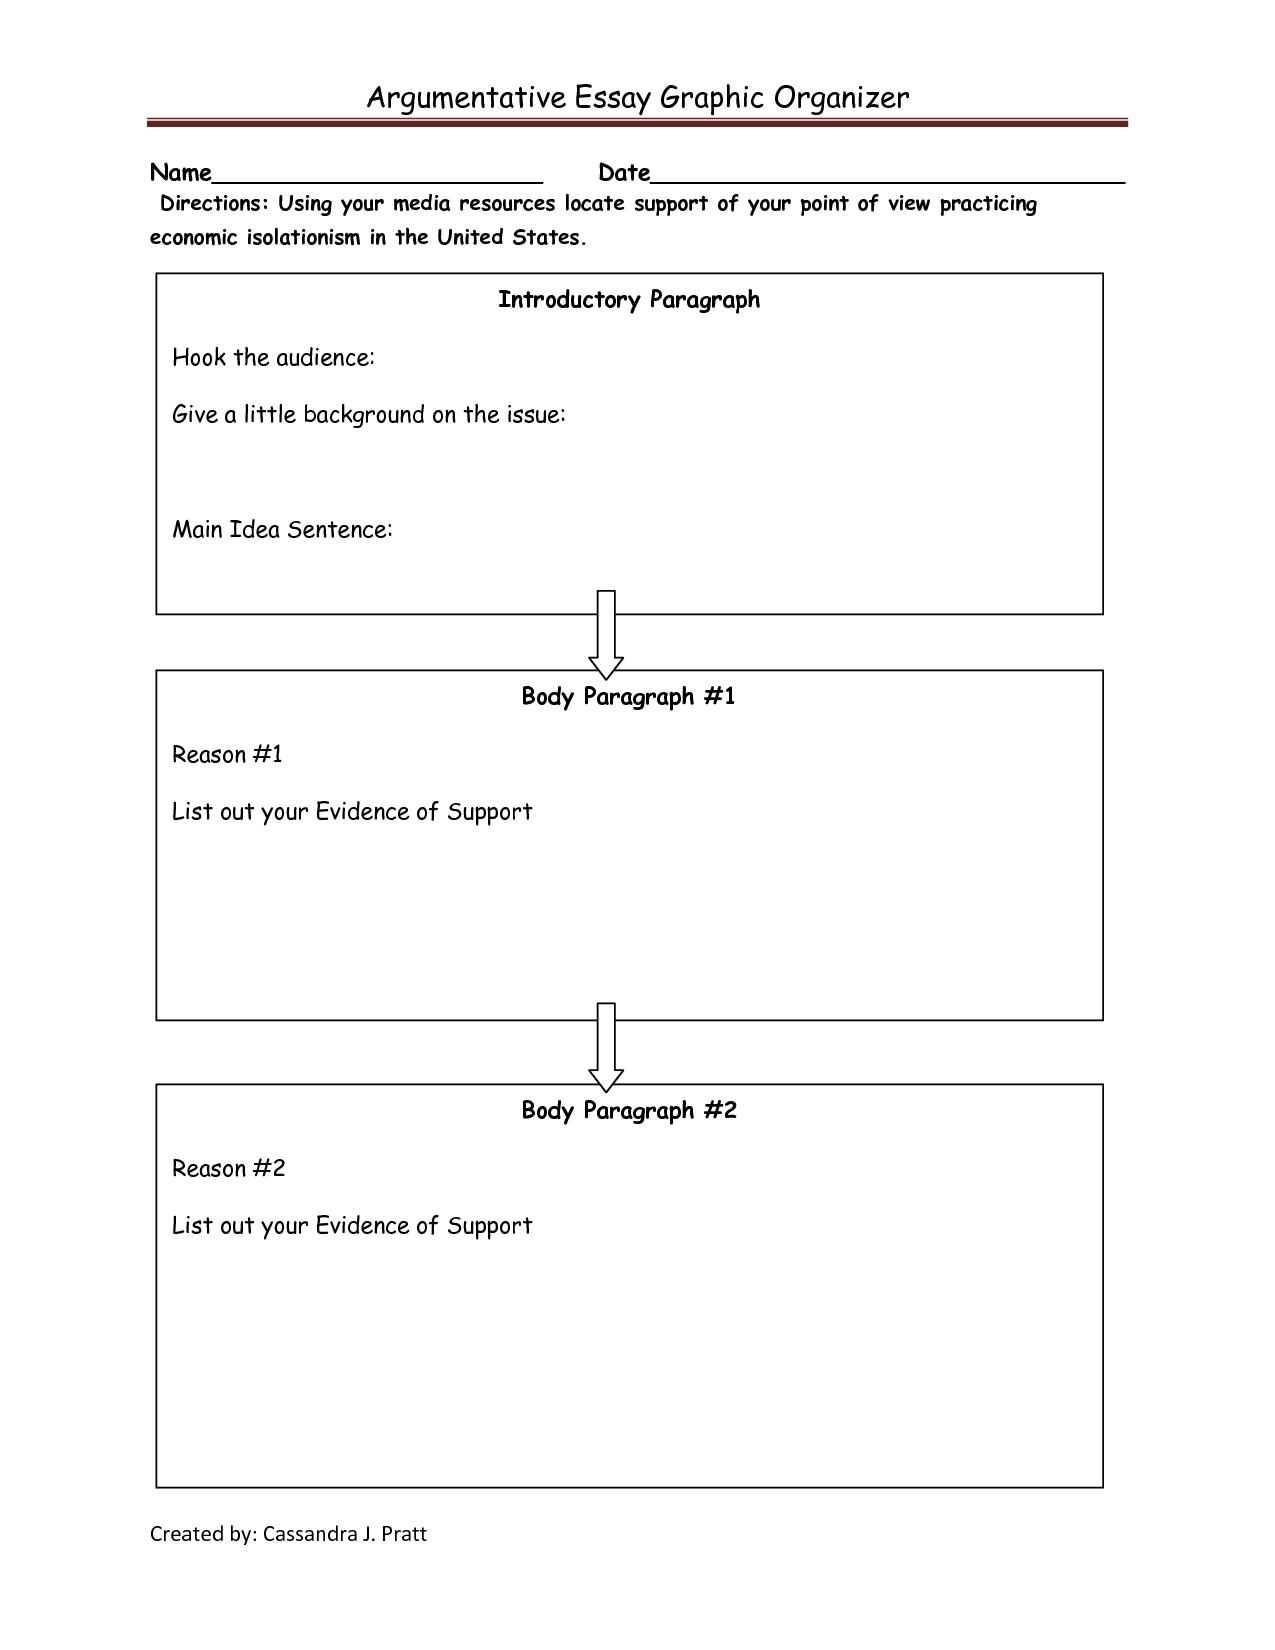 Image Detail For Argumentative Essay Graphic Organizer